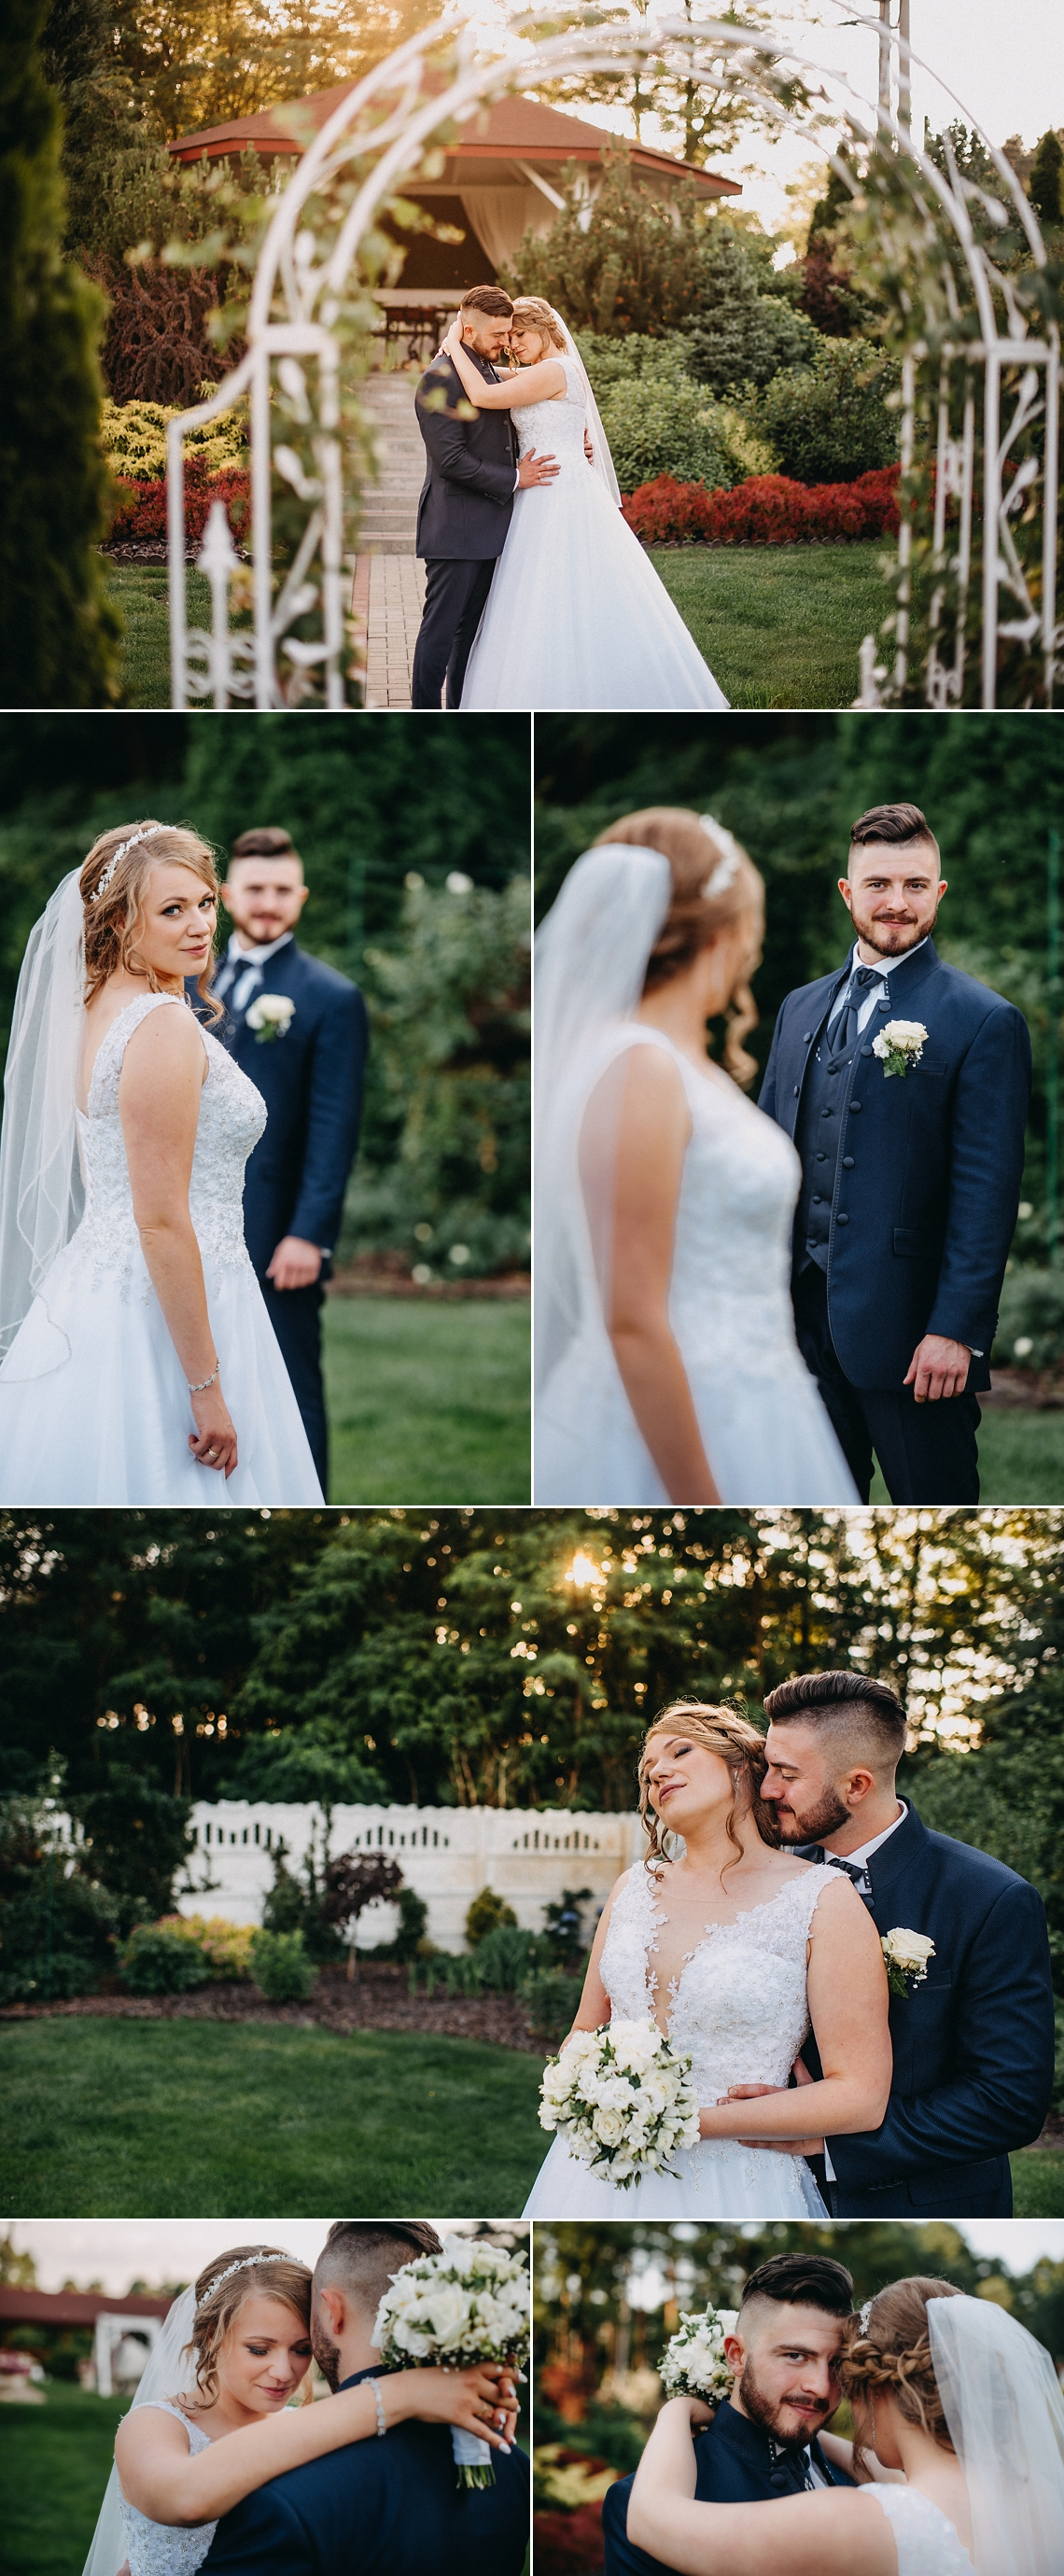 Sesja w dniu ślubu fotograf